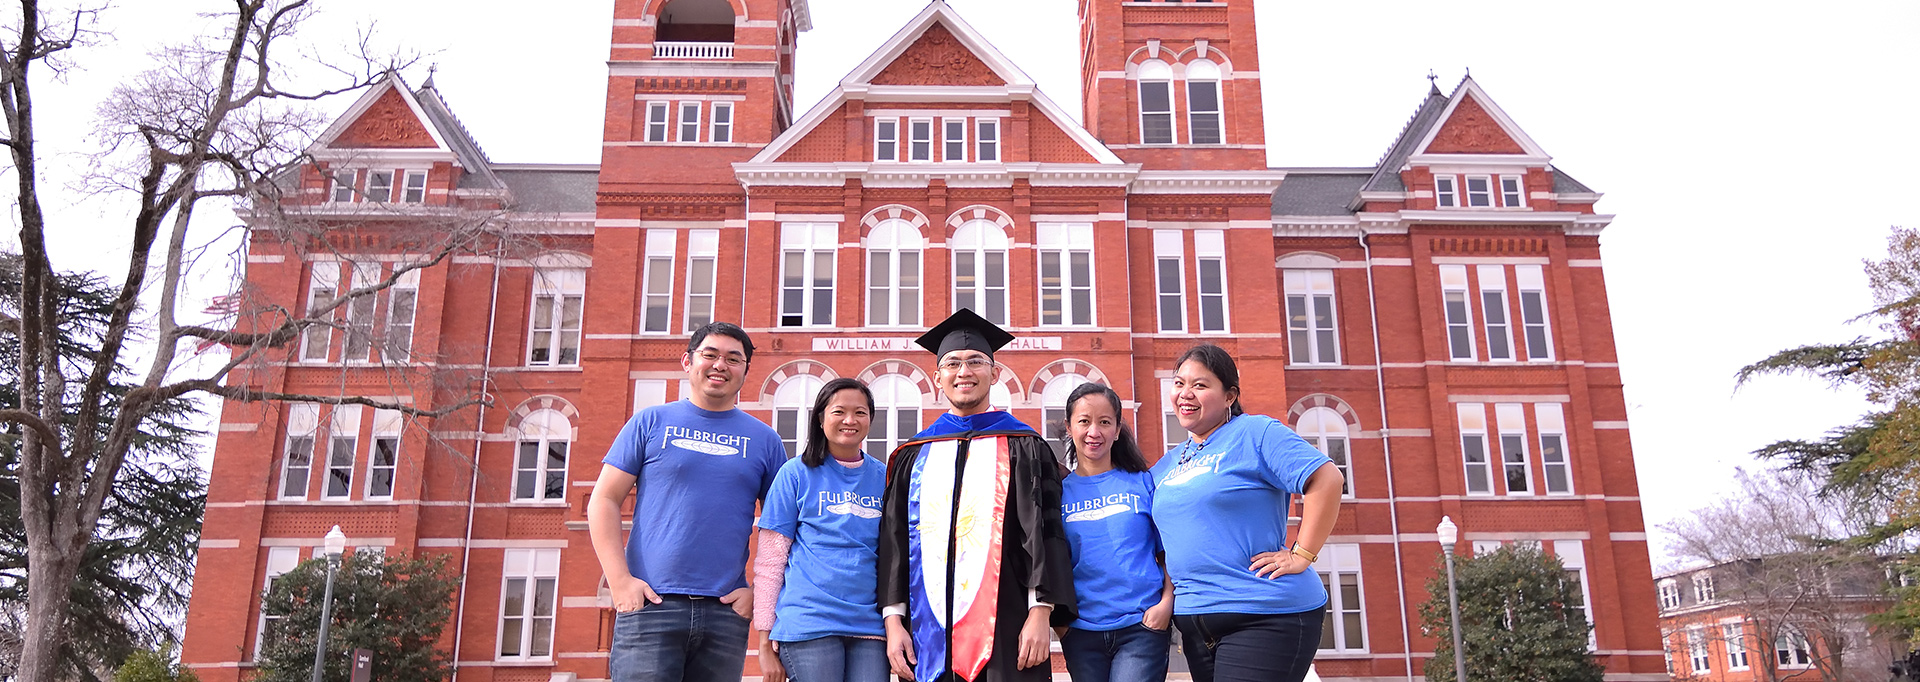 1Slideshow1Fulbright-Graduate-Student